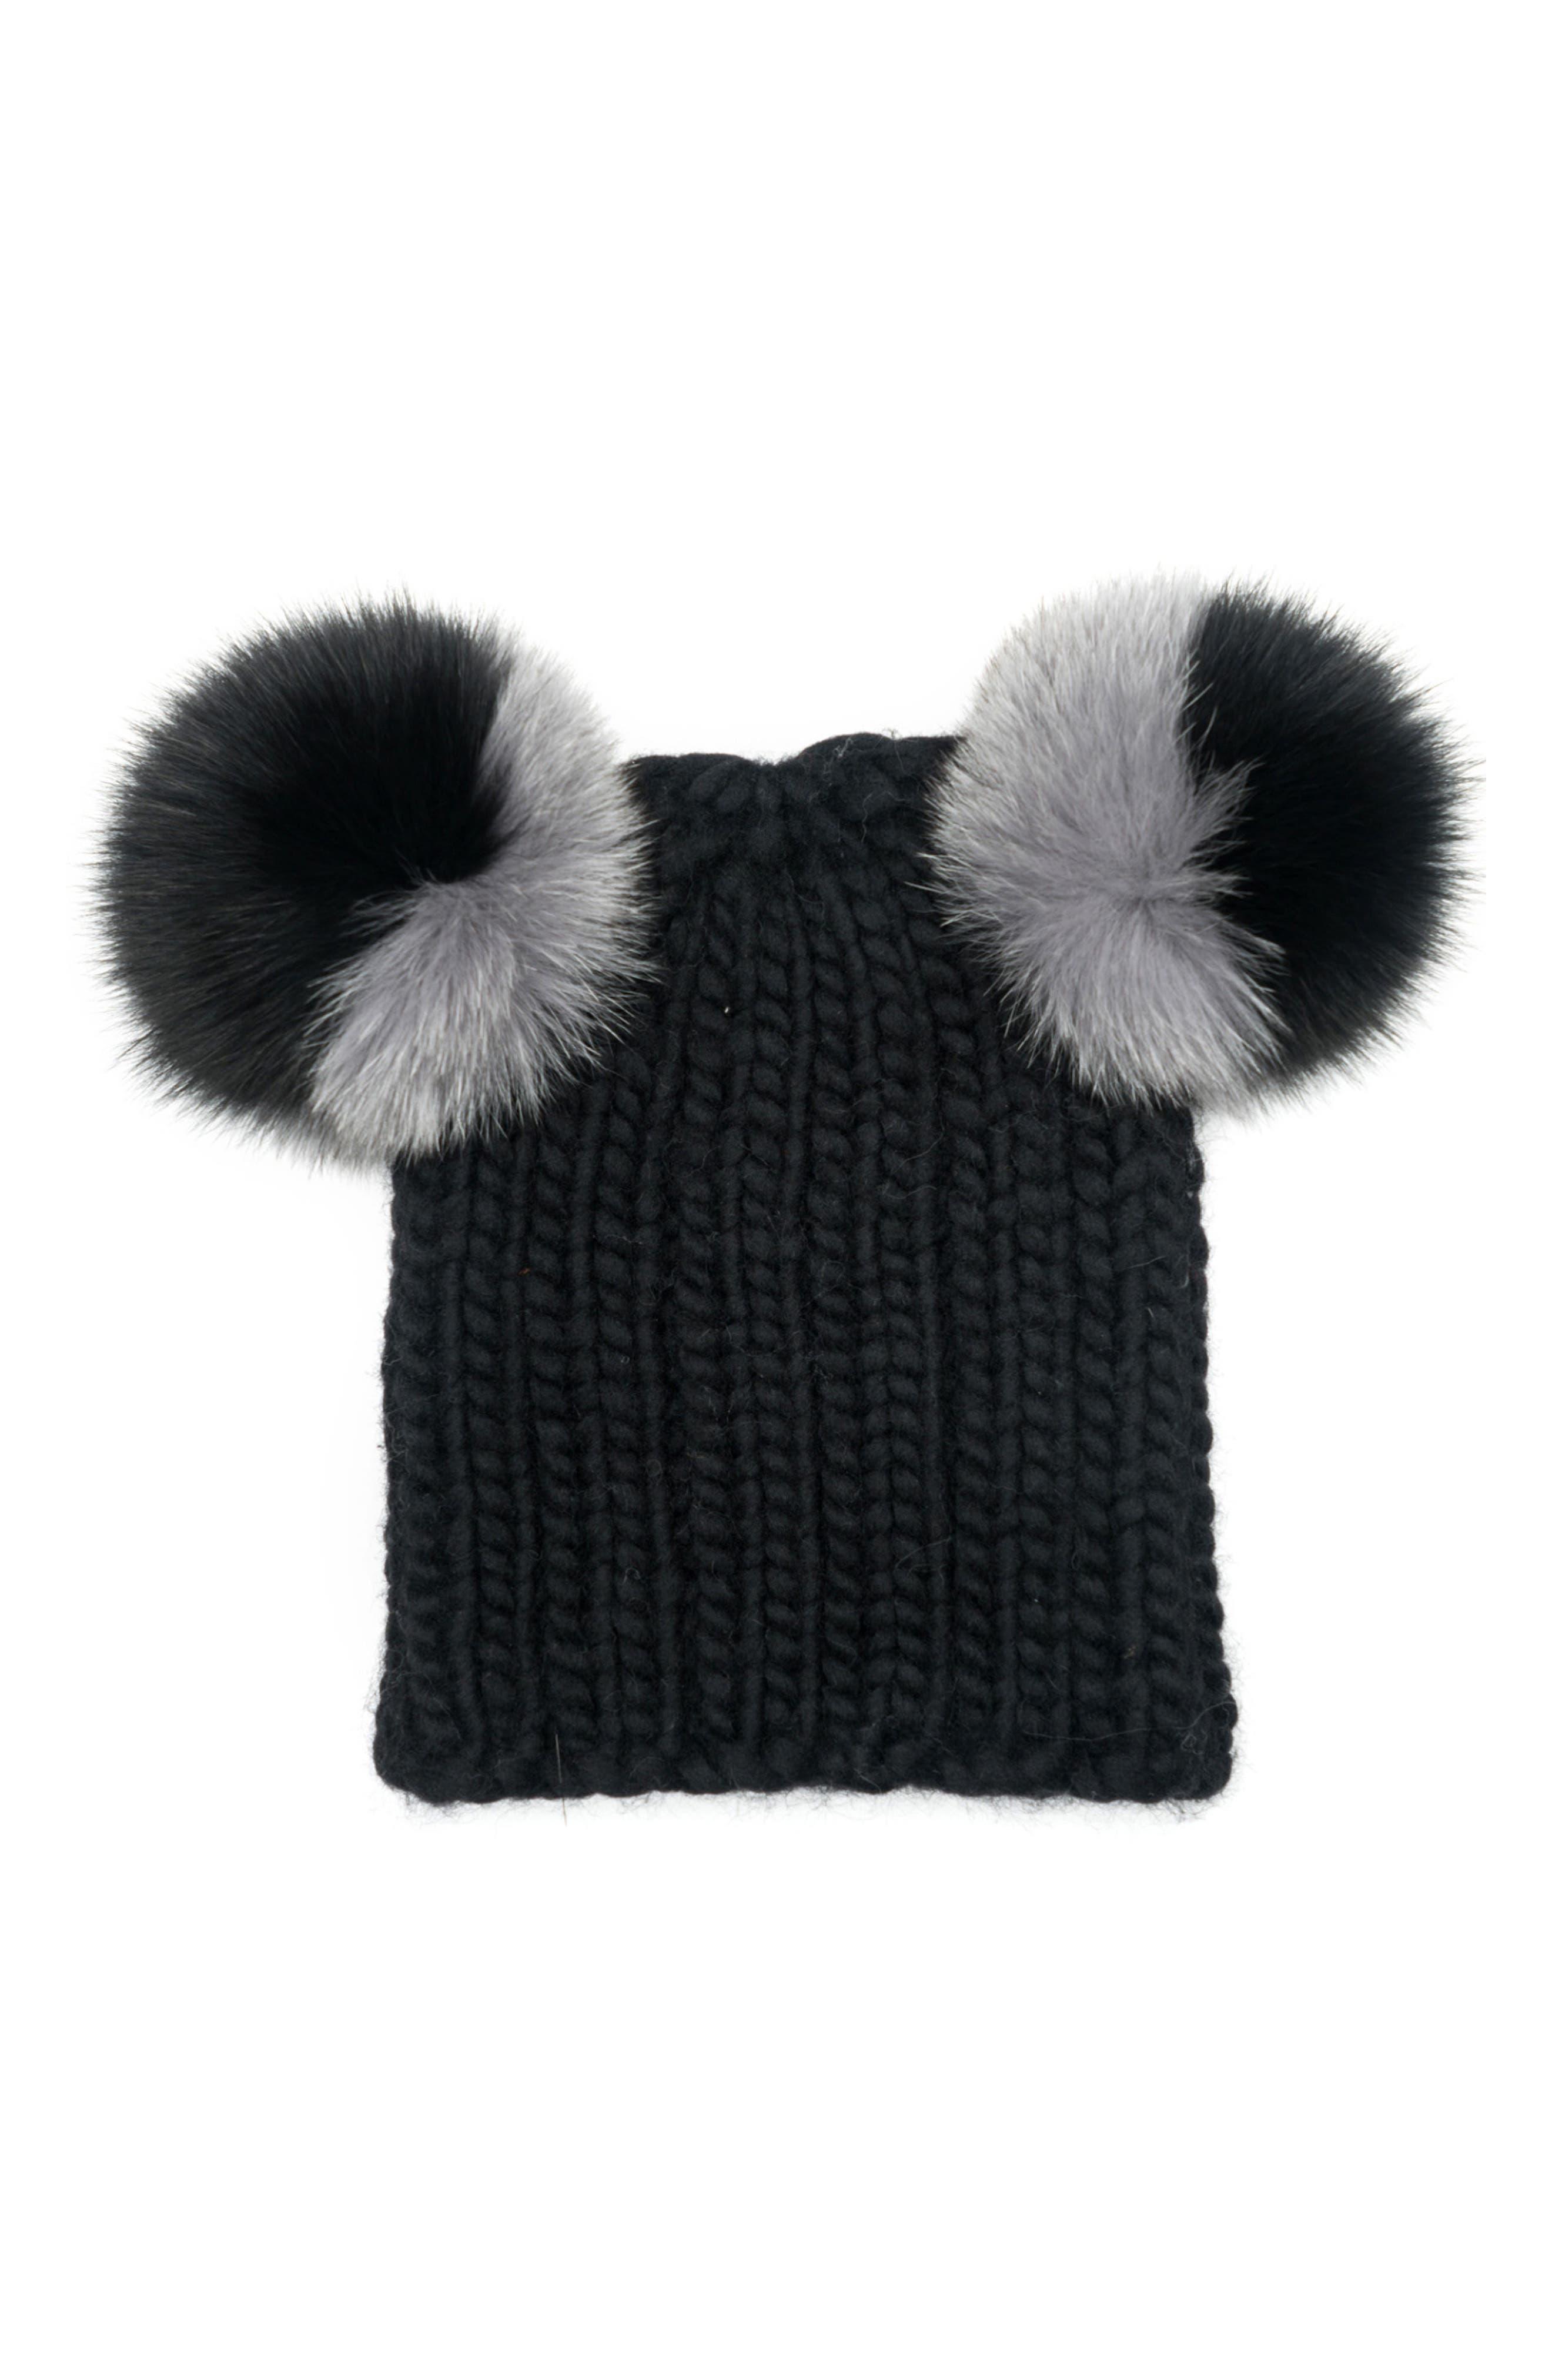 Mimi Beanie with Genuine Fox Fur Pompoms,                         Main,                         color, Black/ Grey